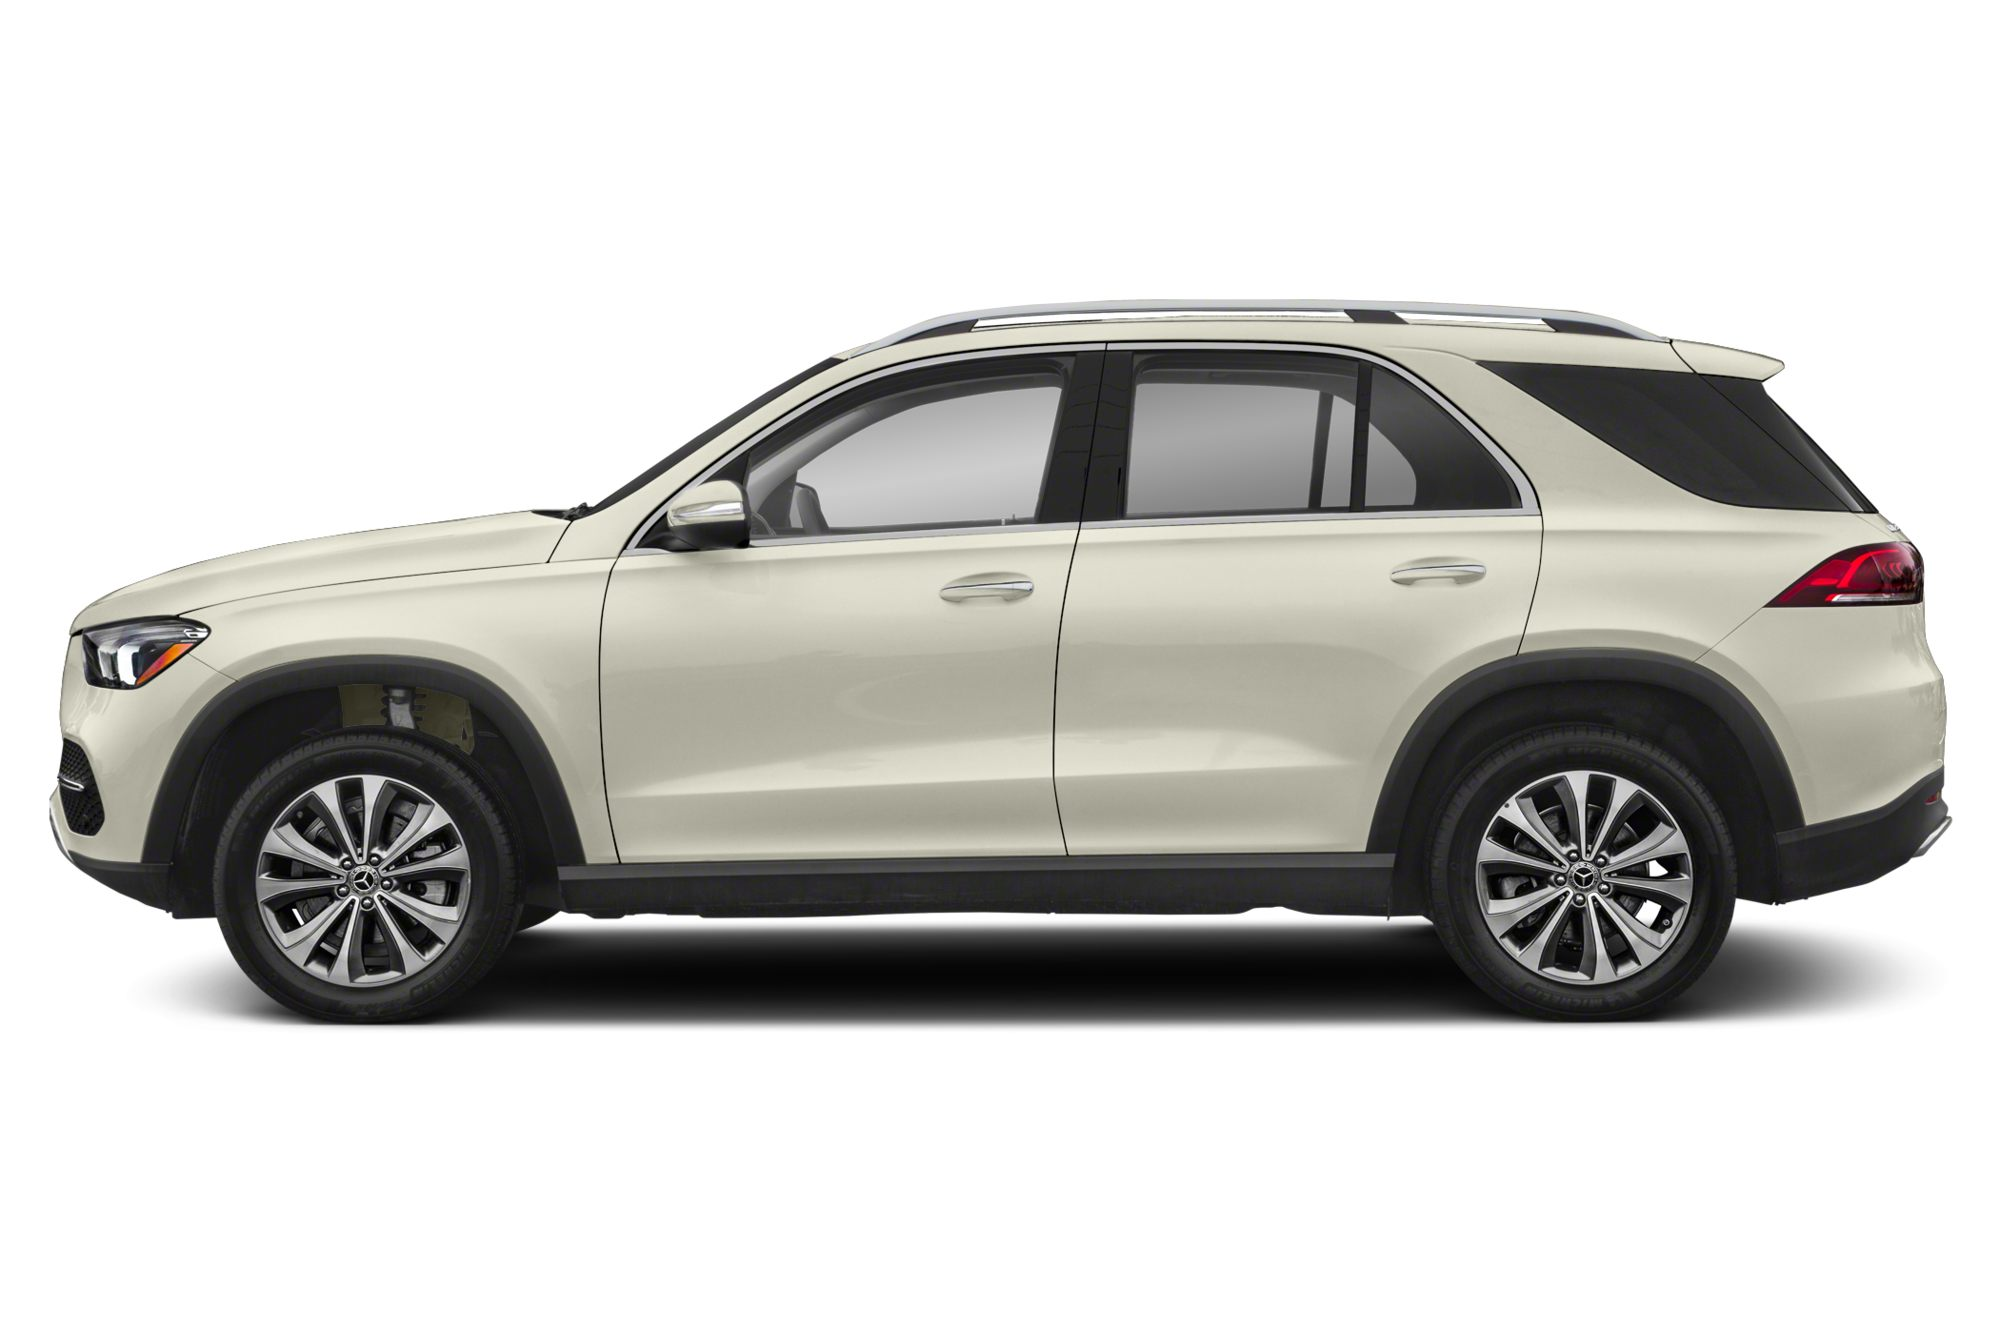 2020 Mercedes-Benz GLE, GLS: Recall Alert